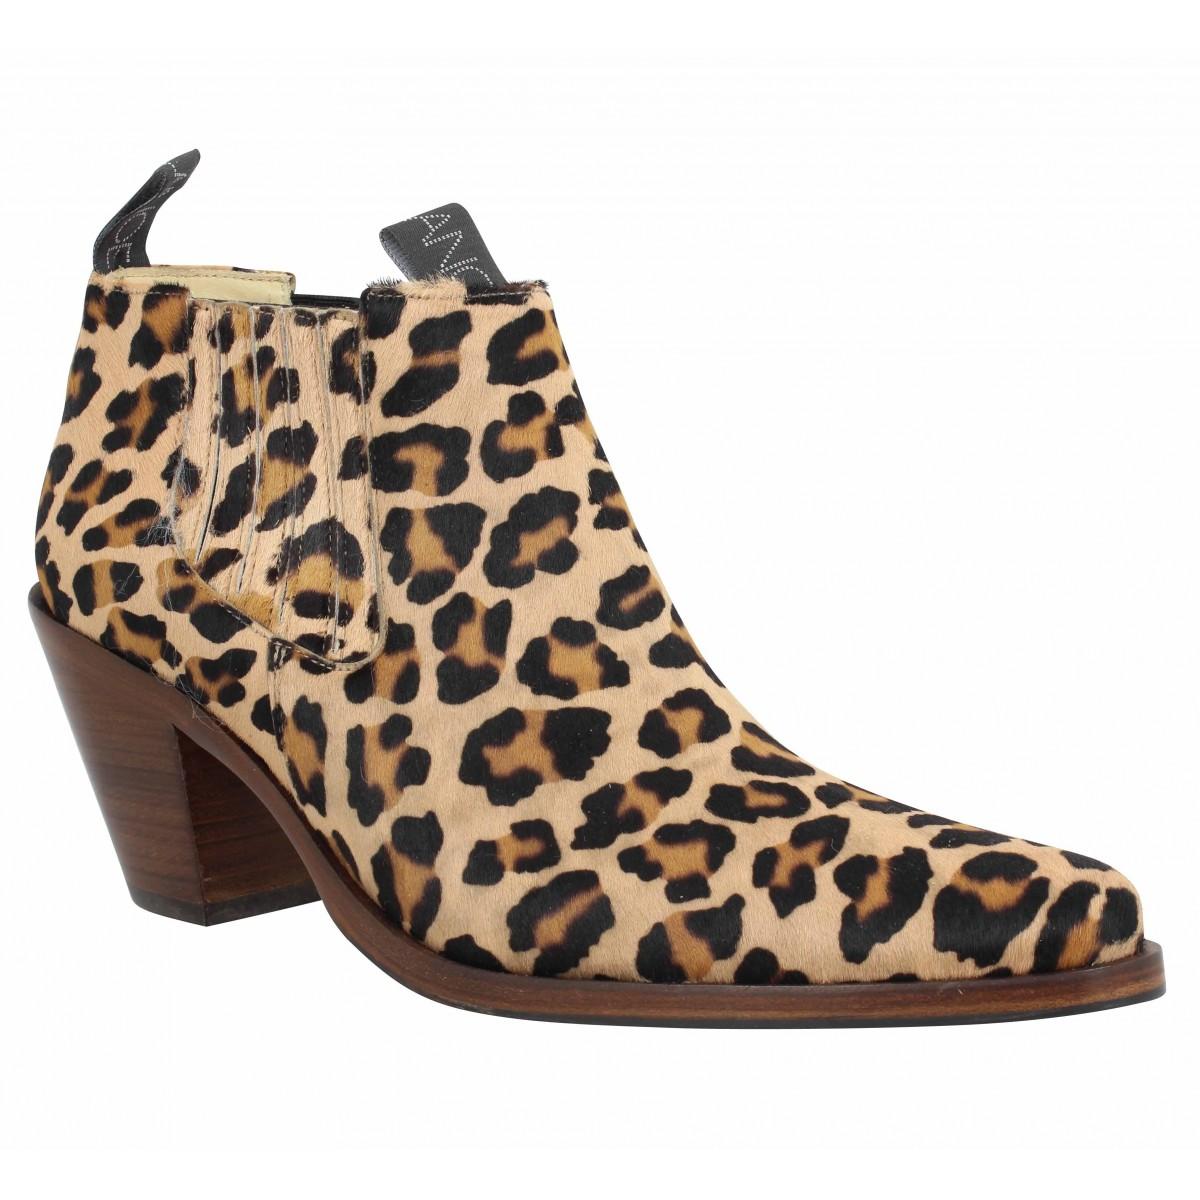 Bottines FREE LANCE Jane 7 Low Chelsea Boot cuir Femme Leopard